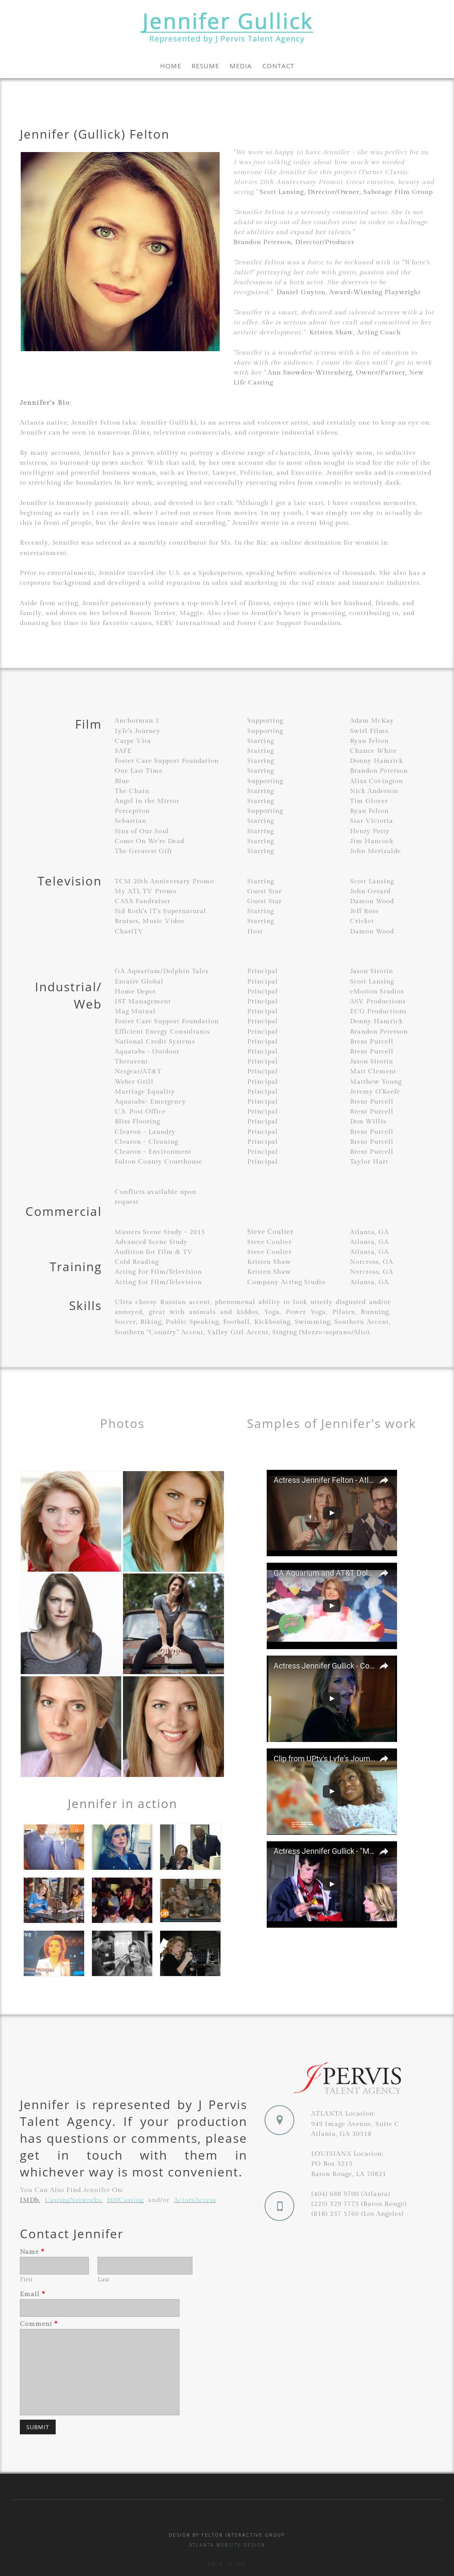 Jennifer Felton - Actress Competitors, Revenue and Employees